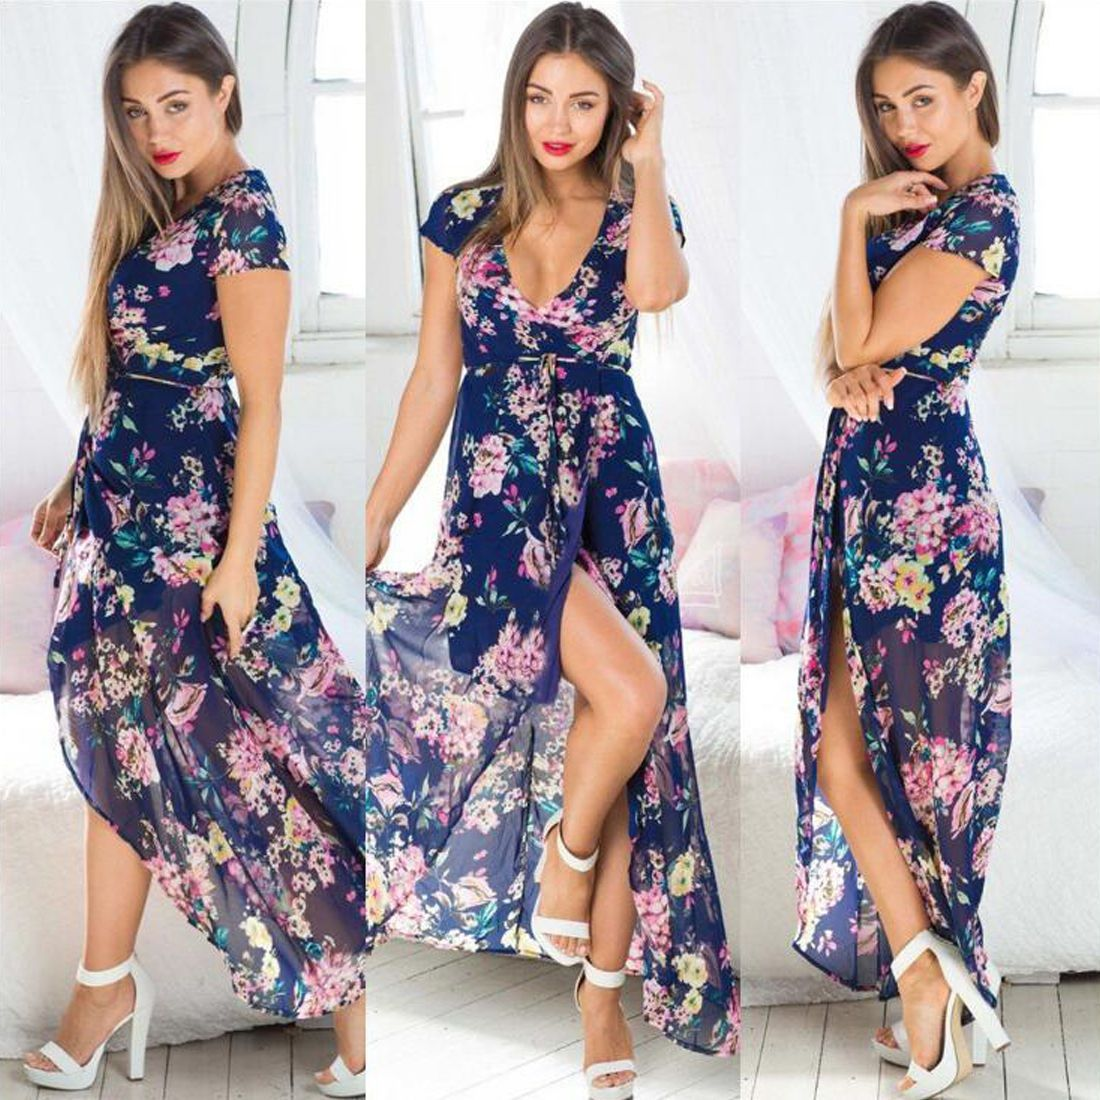 Womens short sleeve summer evening party prom beach long boho floral